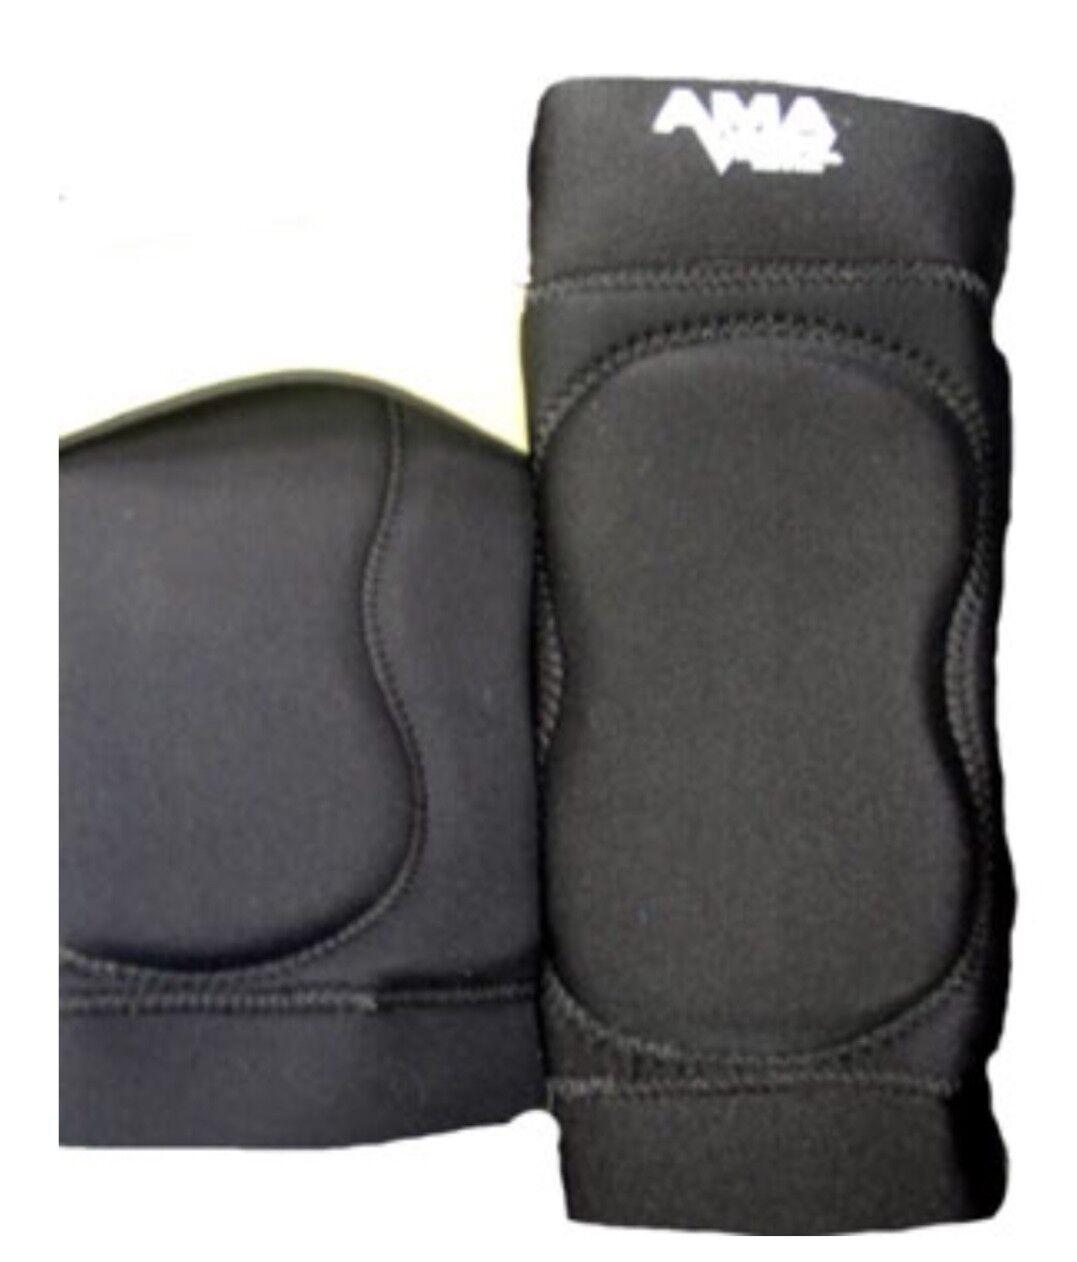 AMA Pro Rodilleras medio Wrestling negro fútbol Mma Judo Deportes jui Jitsu M